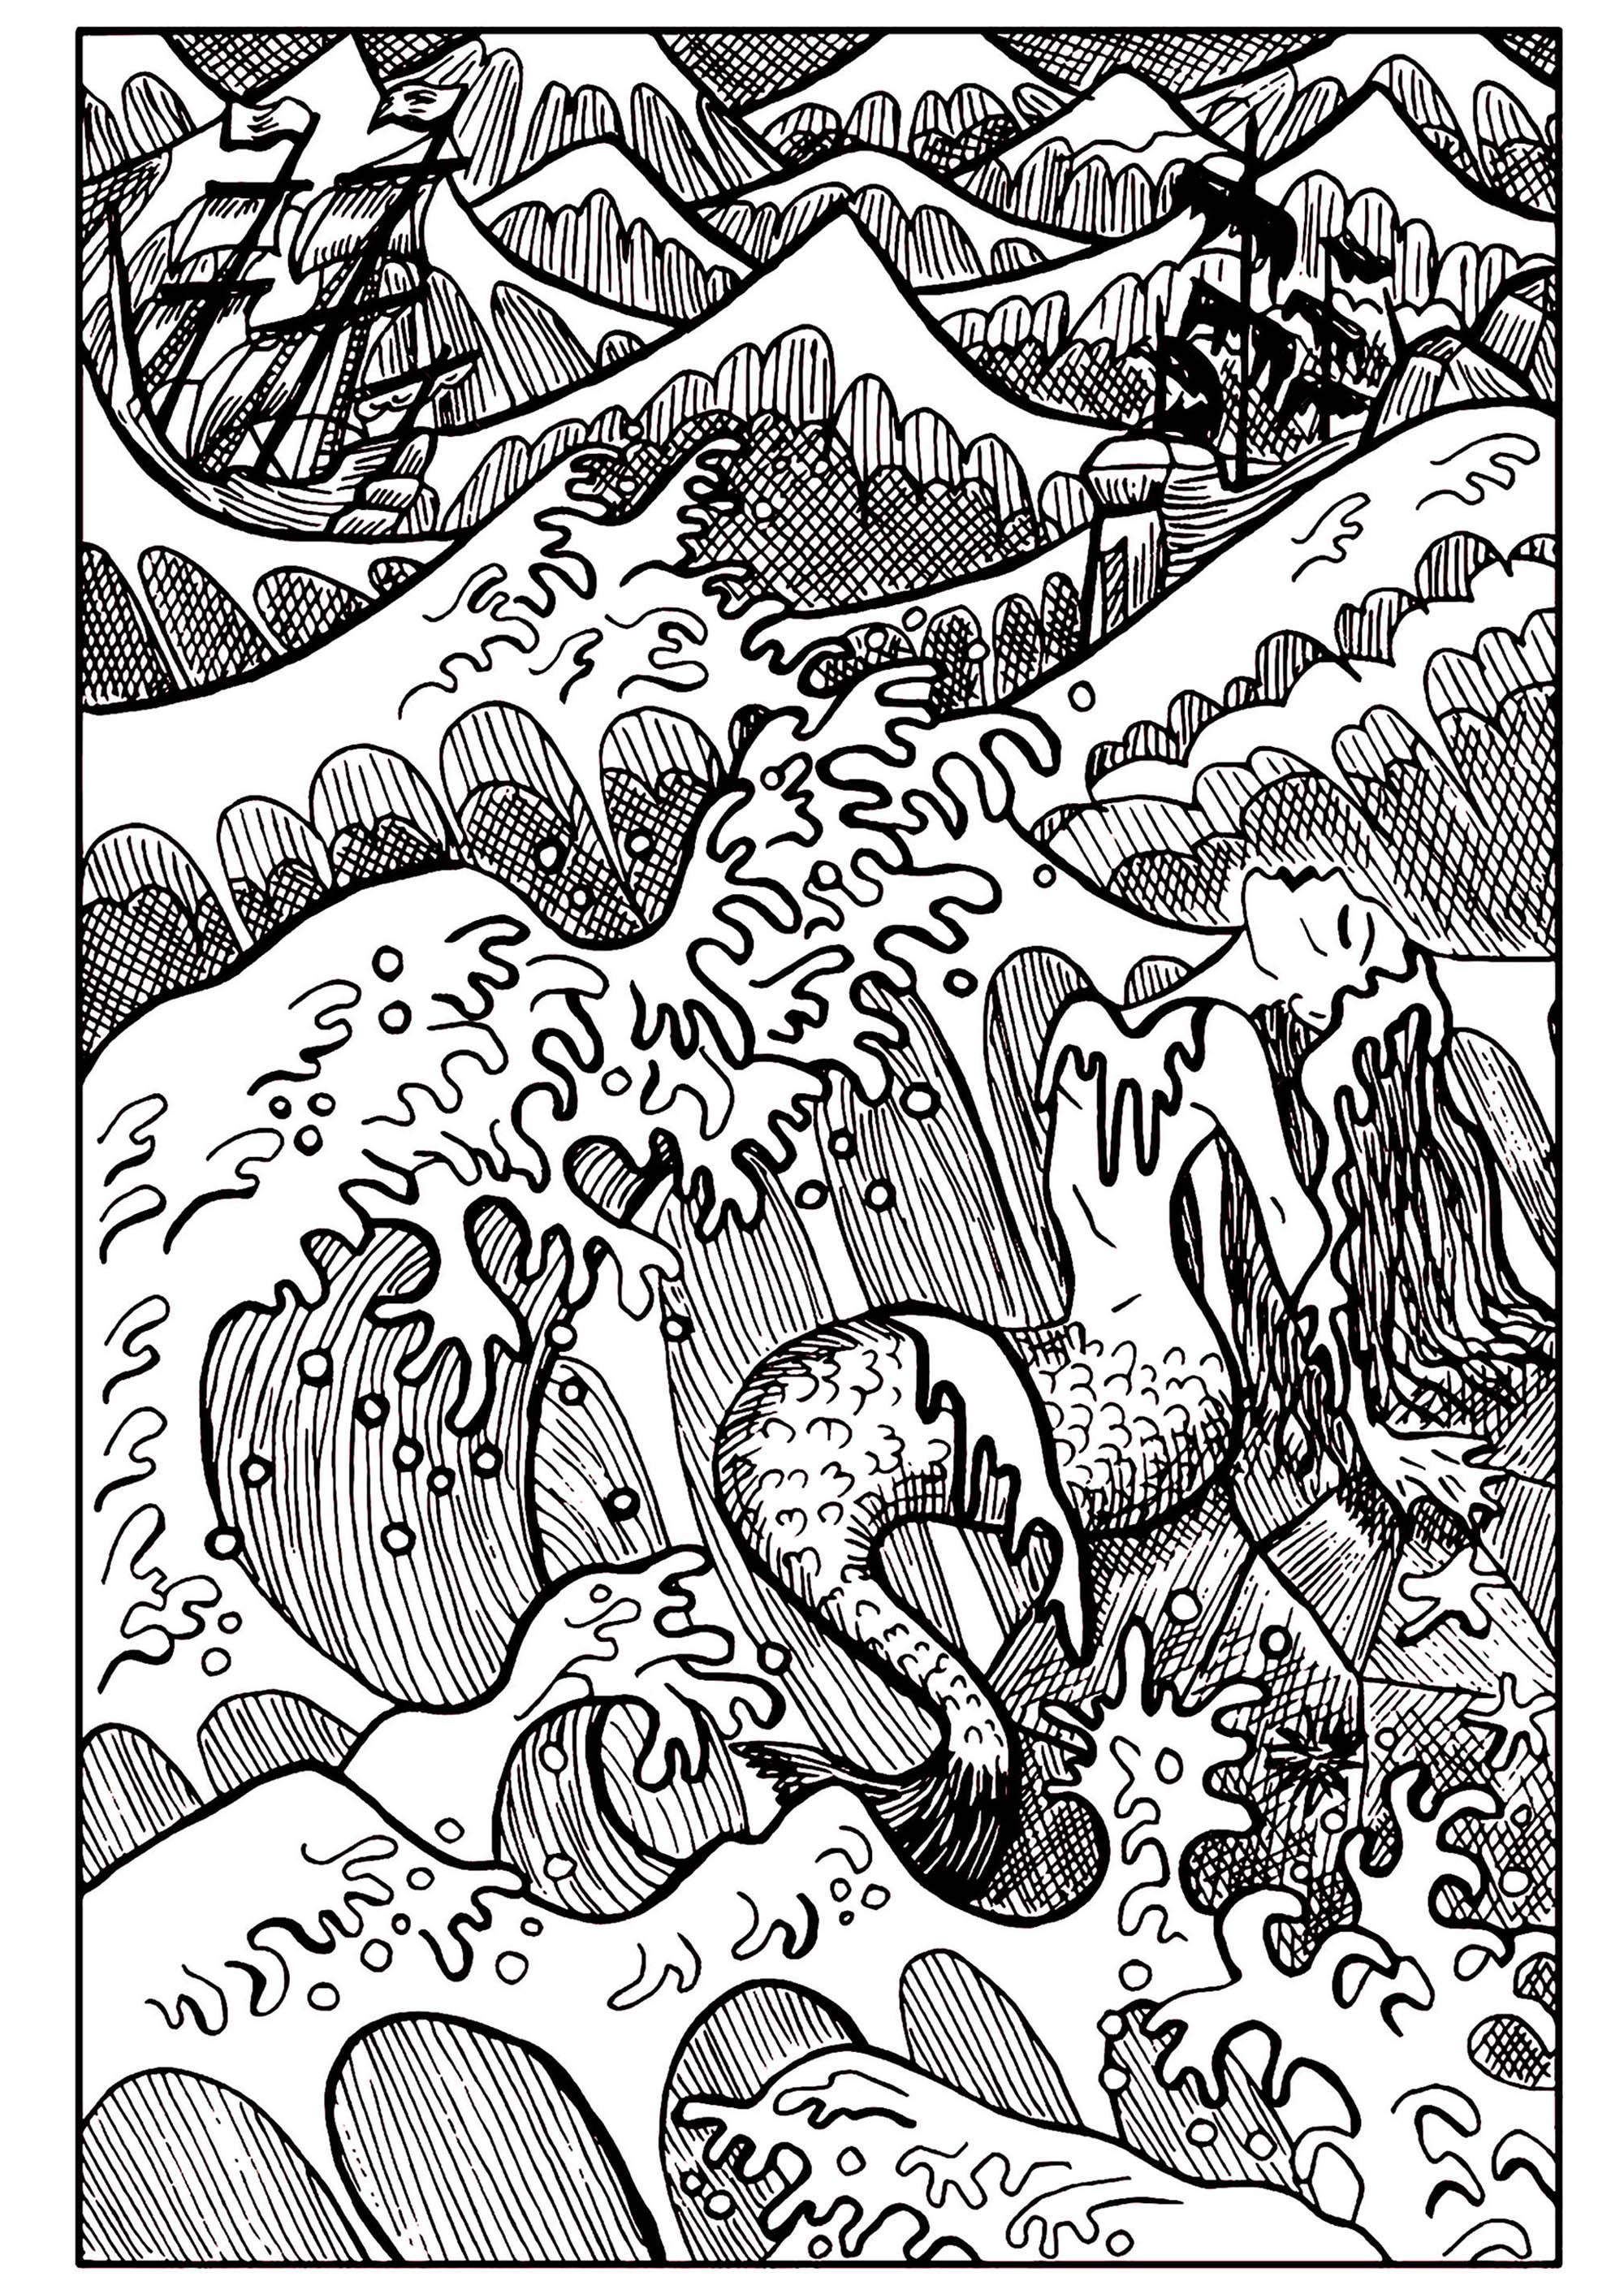 Meerjungfrauen 76883 - Meerjungfrauen - Malbuch Fur Erwachsene